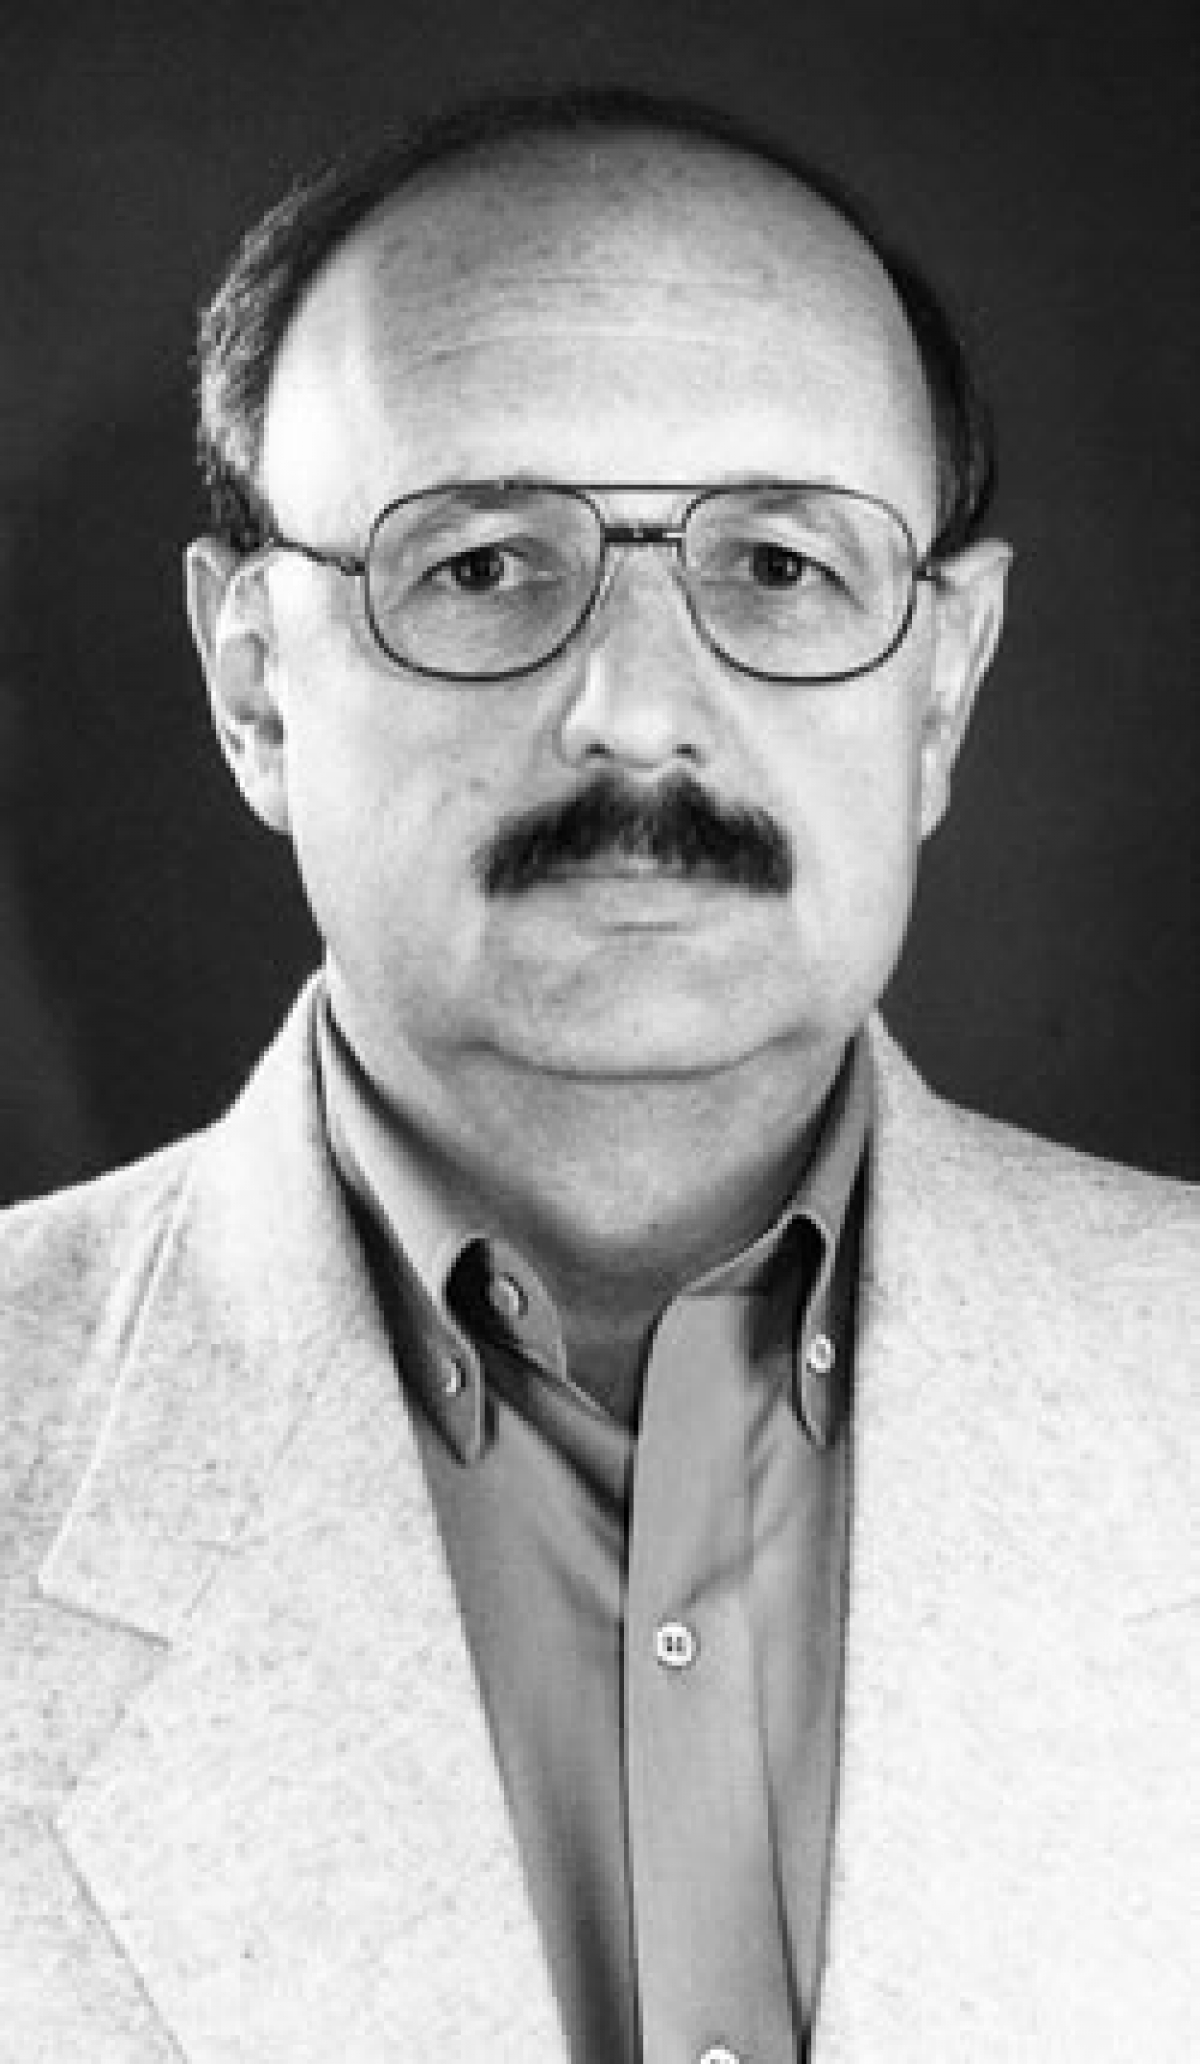 Emilio Gazaniga <br> Neto